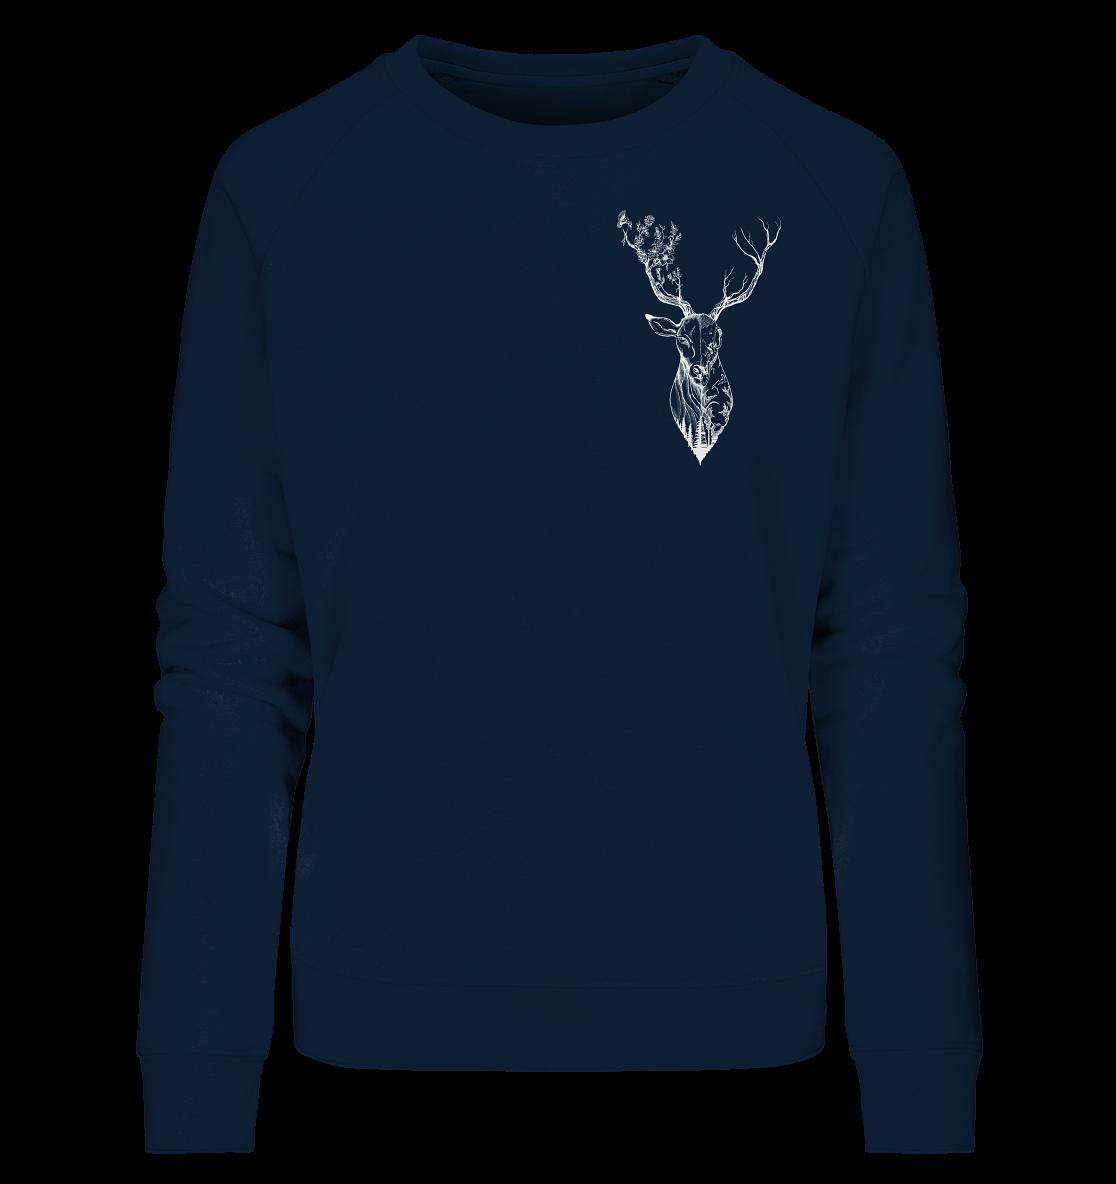 front-ladies-organic-sweatshirt-0e2035-1116x-6.png